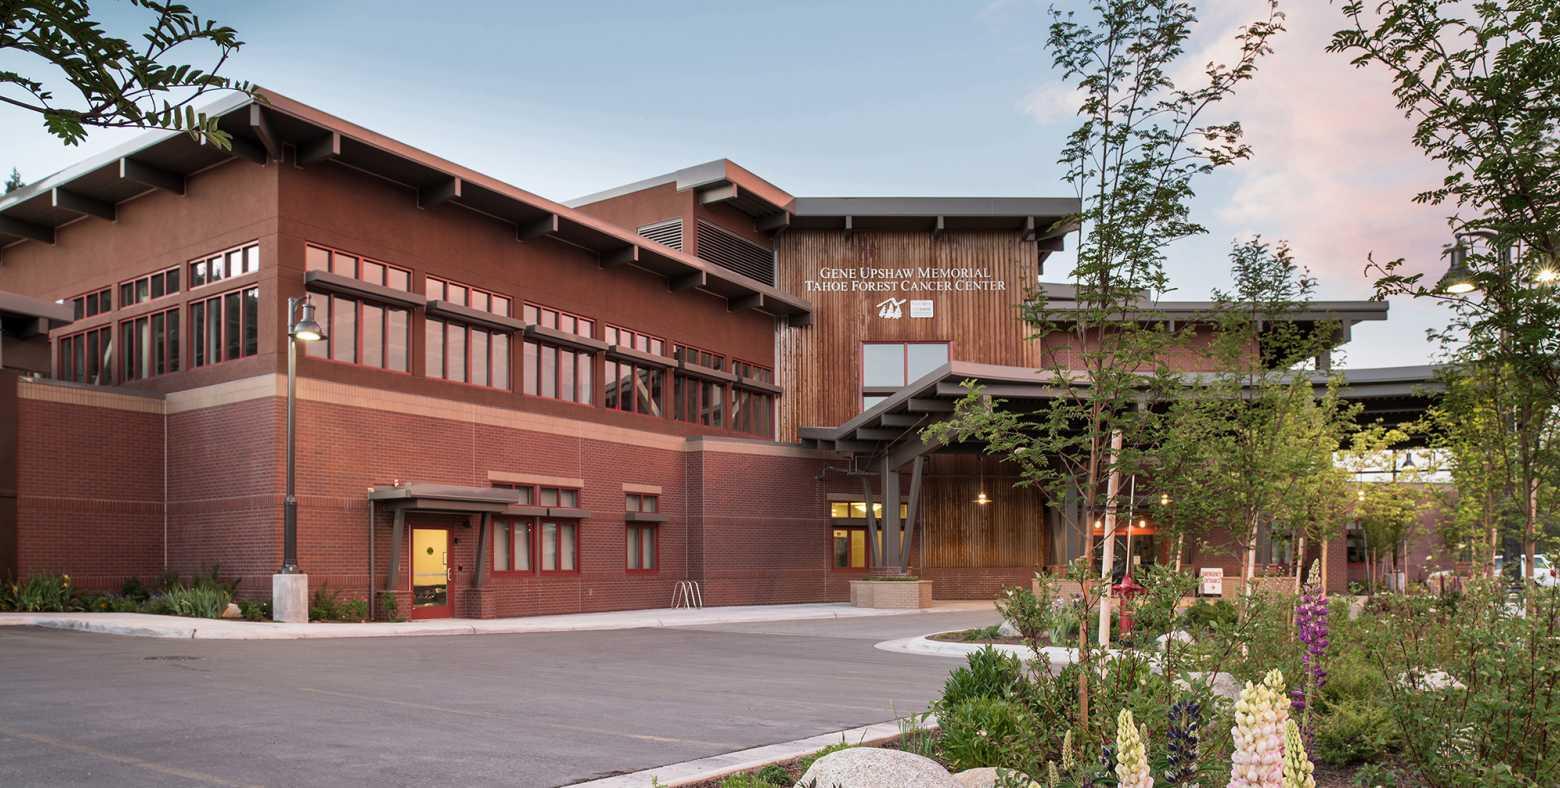 Gene Upshaw Memorial Tahoe Forest Cancer Center